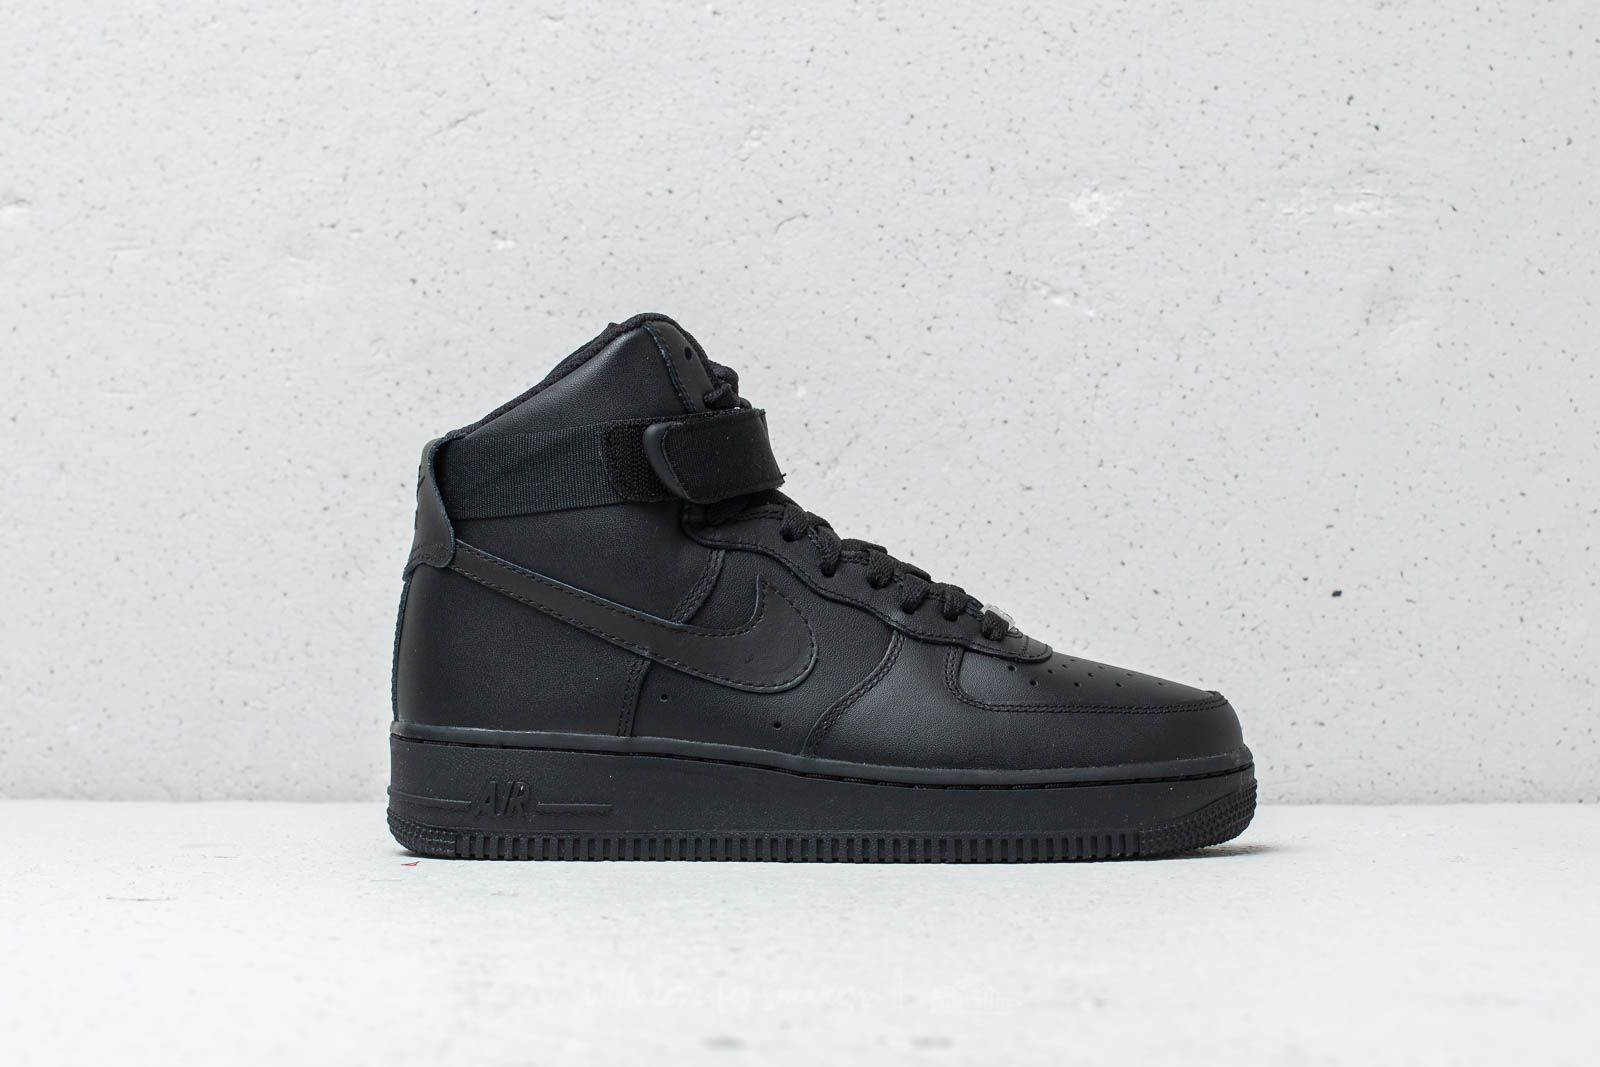 b0e1ed0c Nike Wmns Air Force 1 High Black/ Black-Black at a great price 117